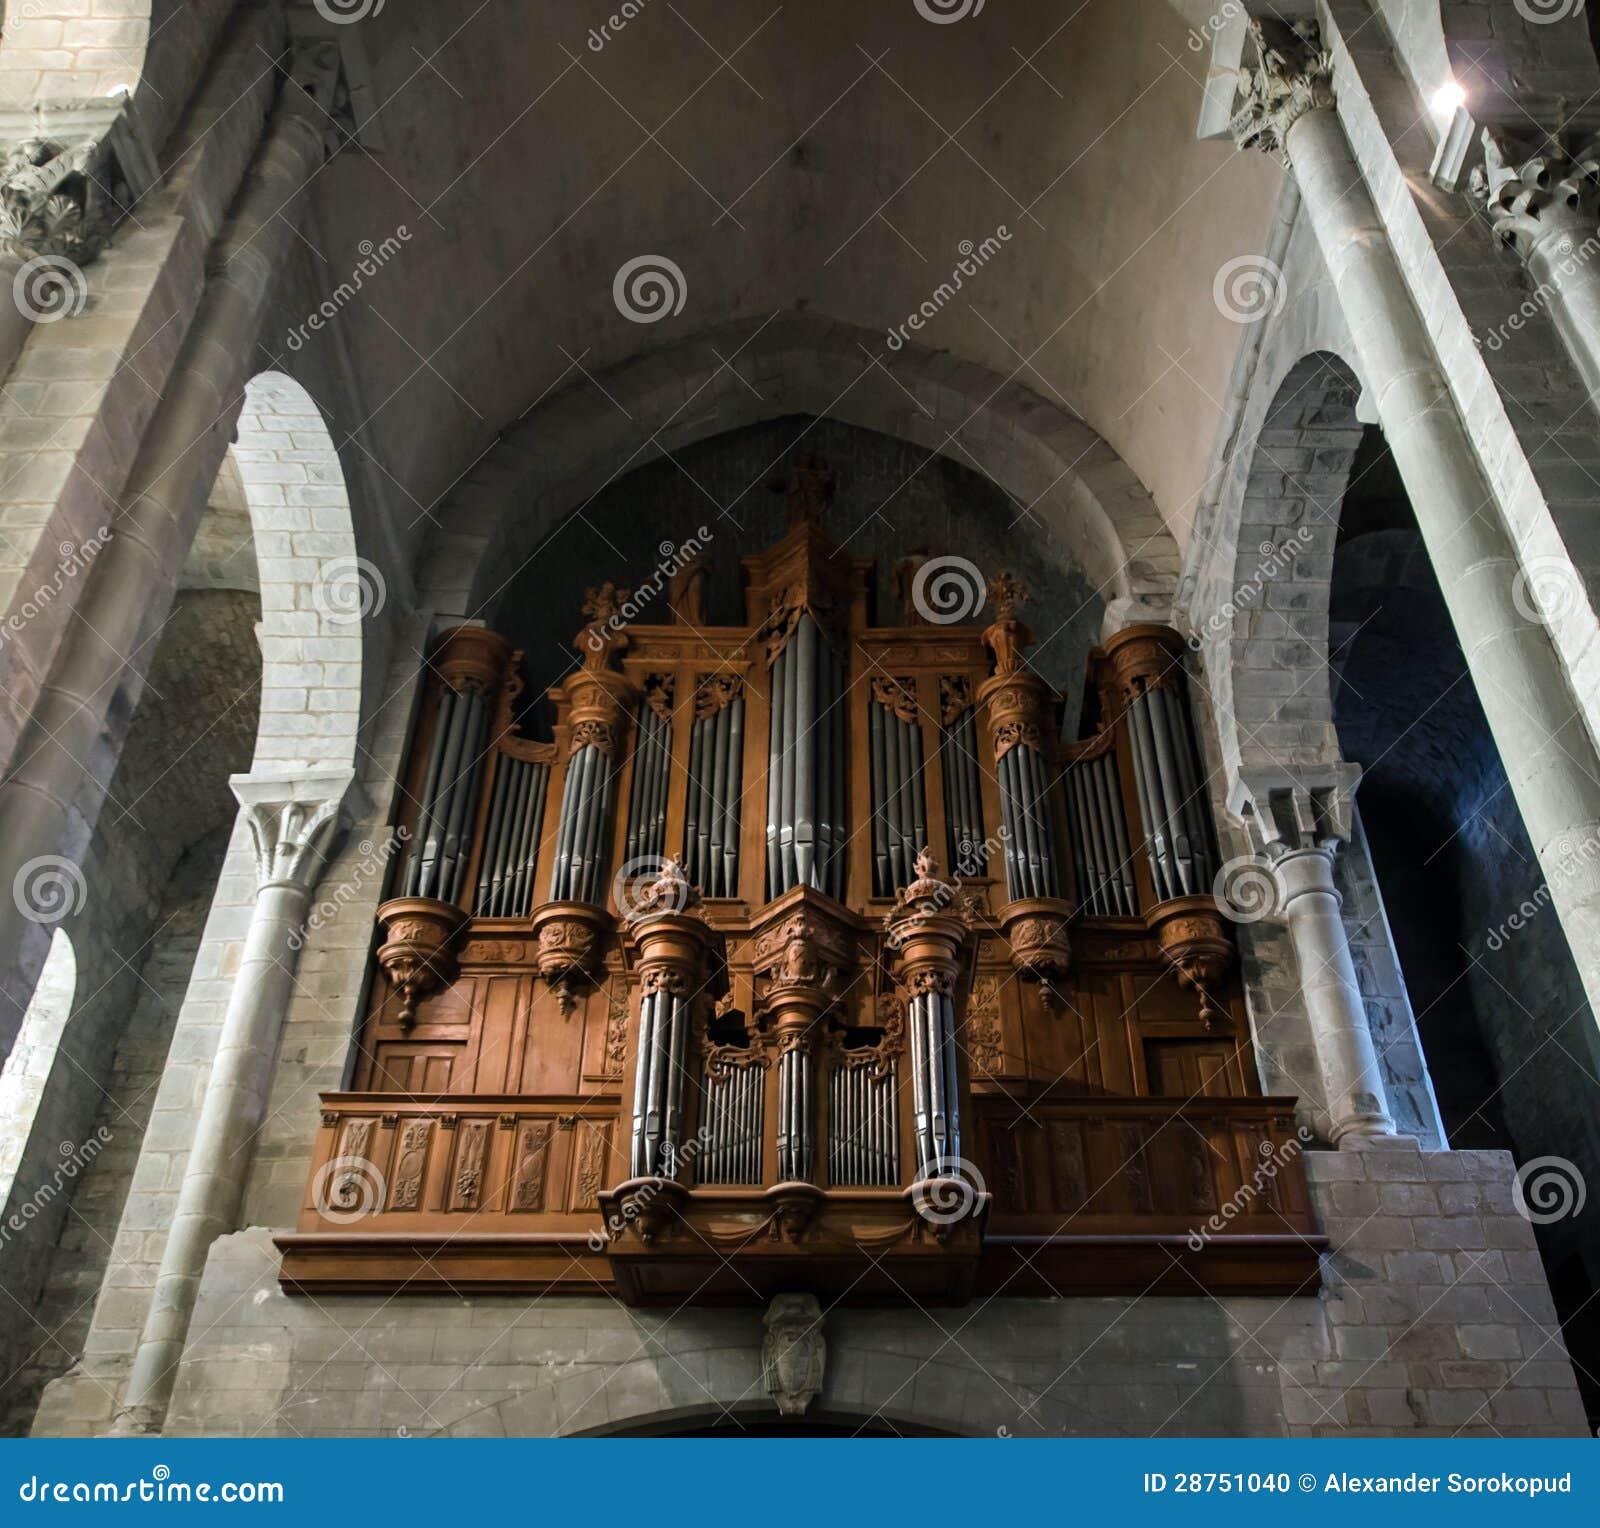 Majestic Carcassone Cathedral Interiors. Sun Light. Stock ...